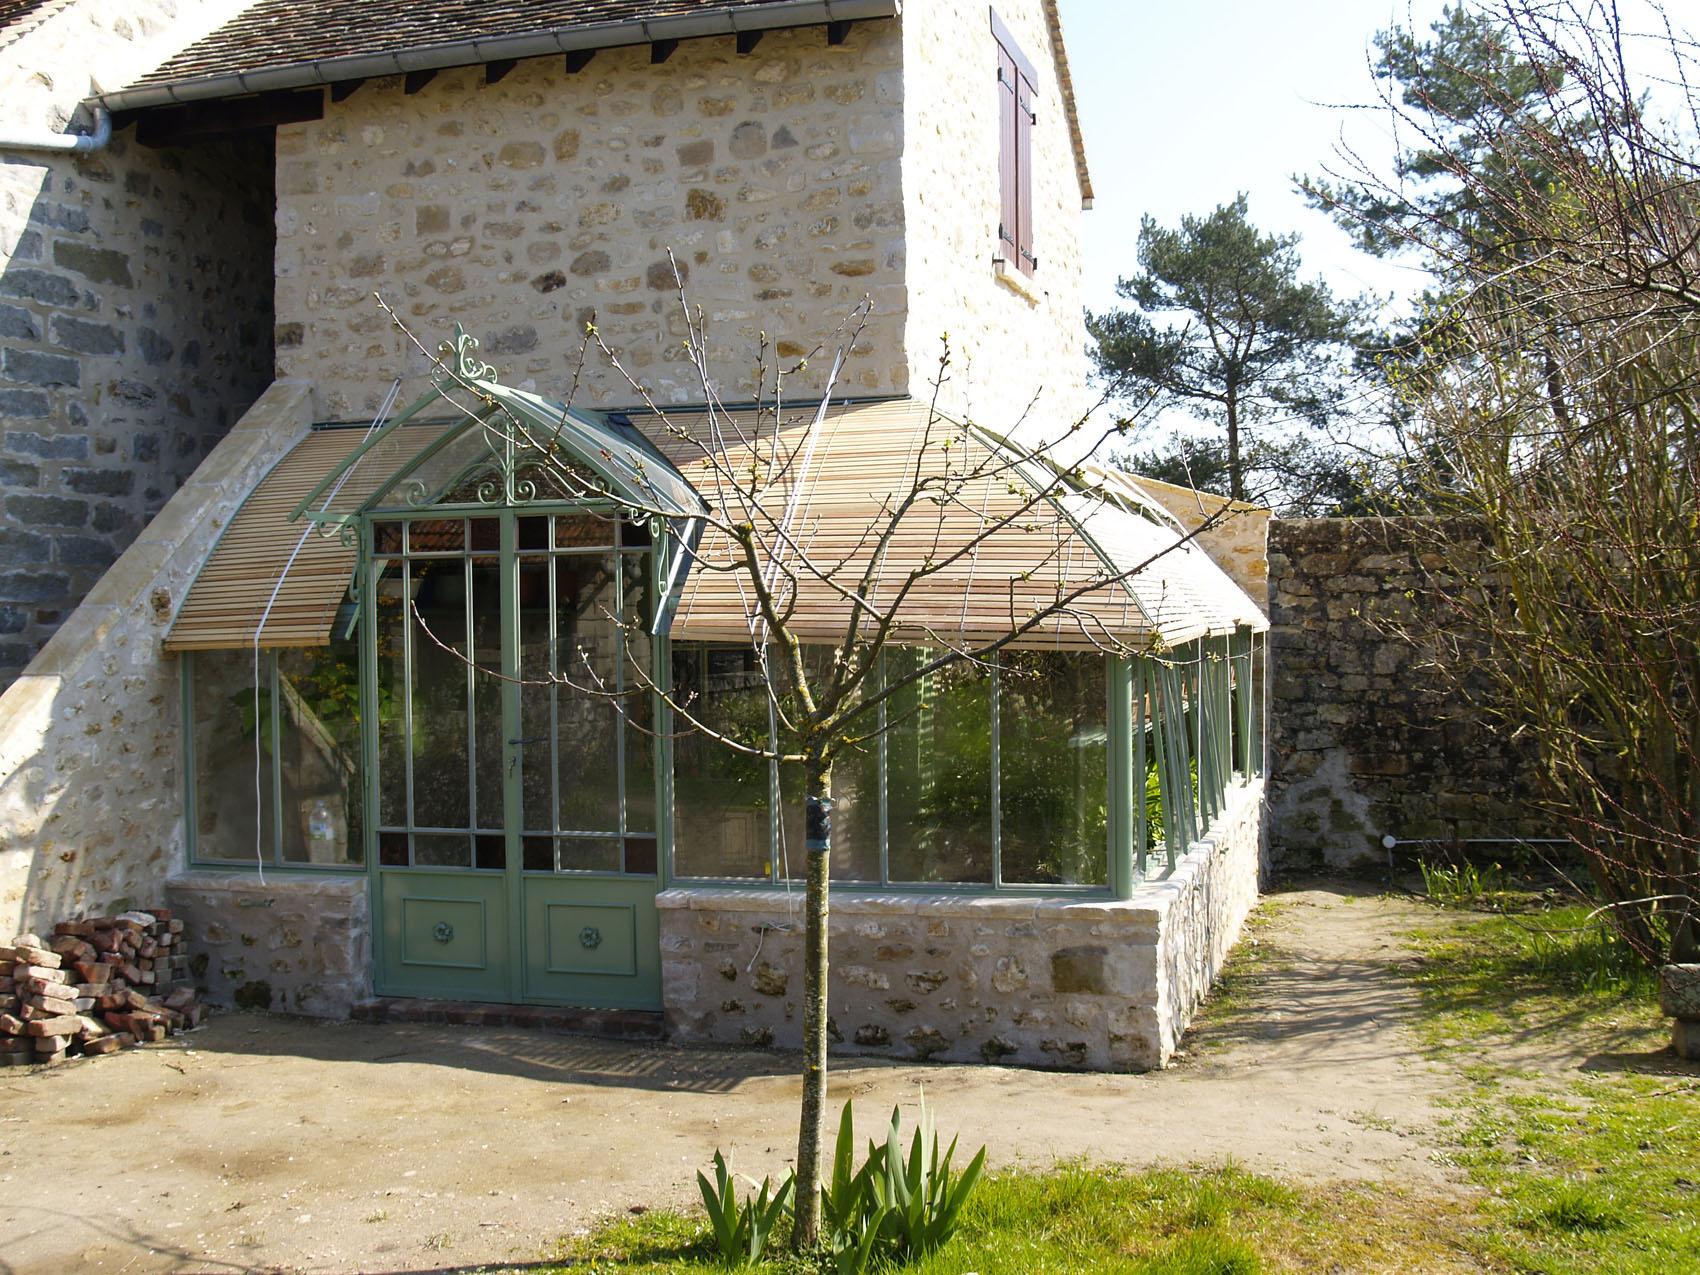 Lean-To Greenhouses | Serres Et Ferronneries D'antan dedans Serre Adosse